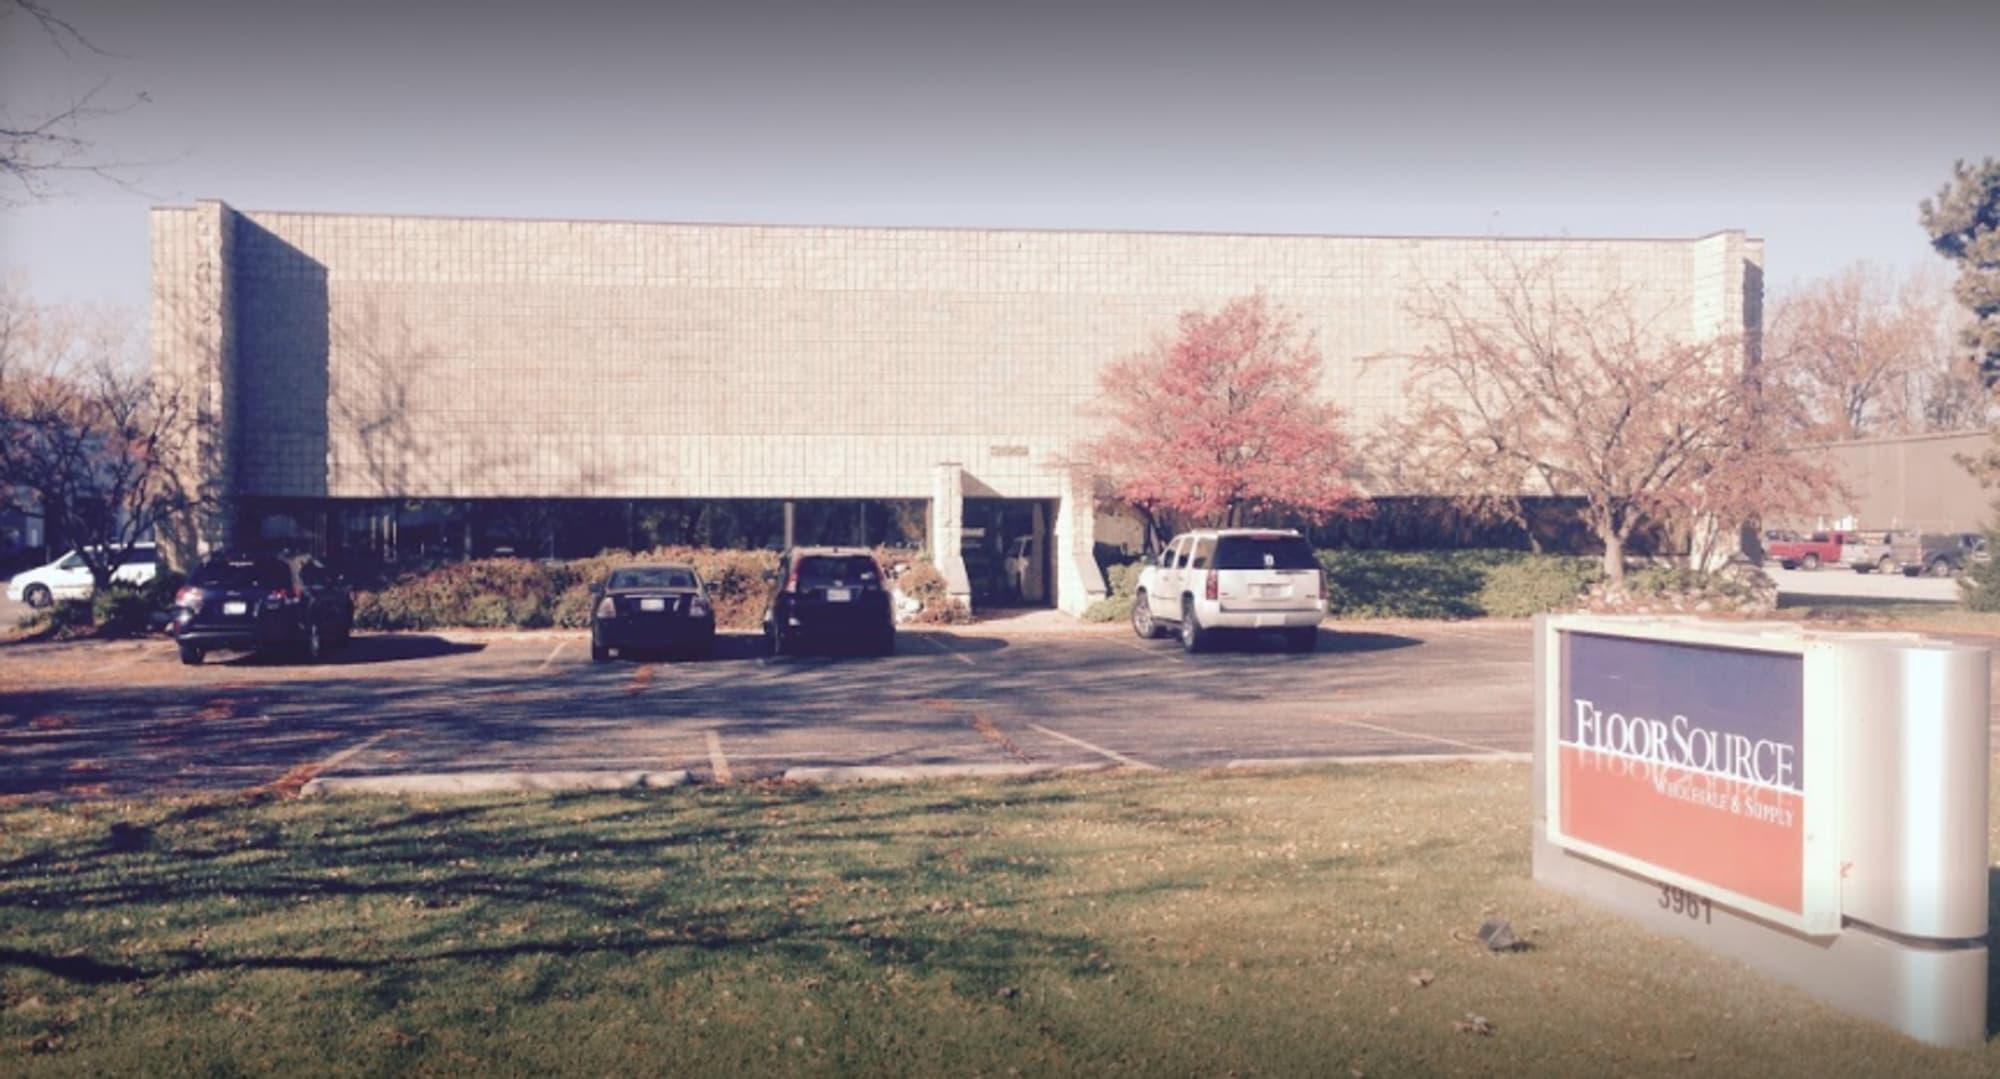 Floor Source Wholesale and Supply - 3961 Roger B Chaffee Memorial Blvd SE Grand Rapids, MI 49548